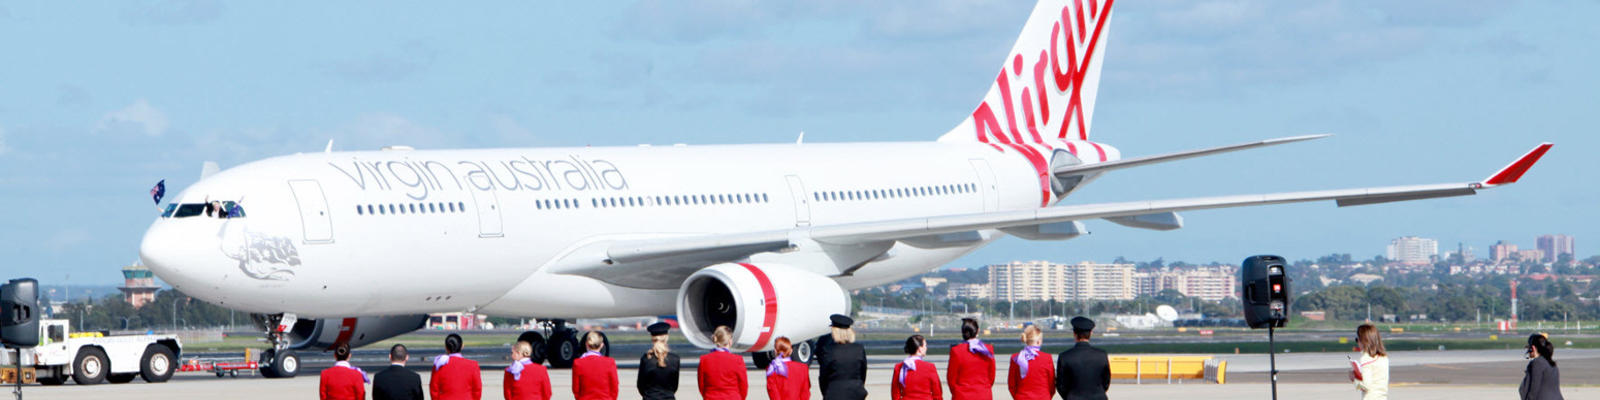 Virgin crew members standing on a red carpet looking at one of Virgin Australia's planes